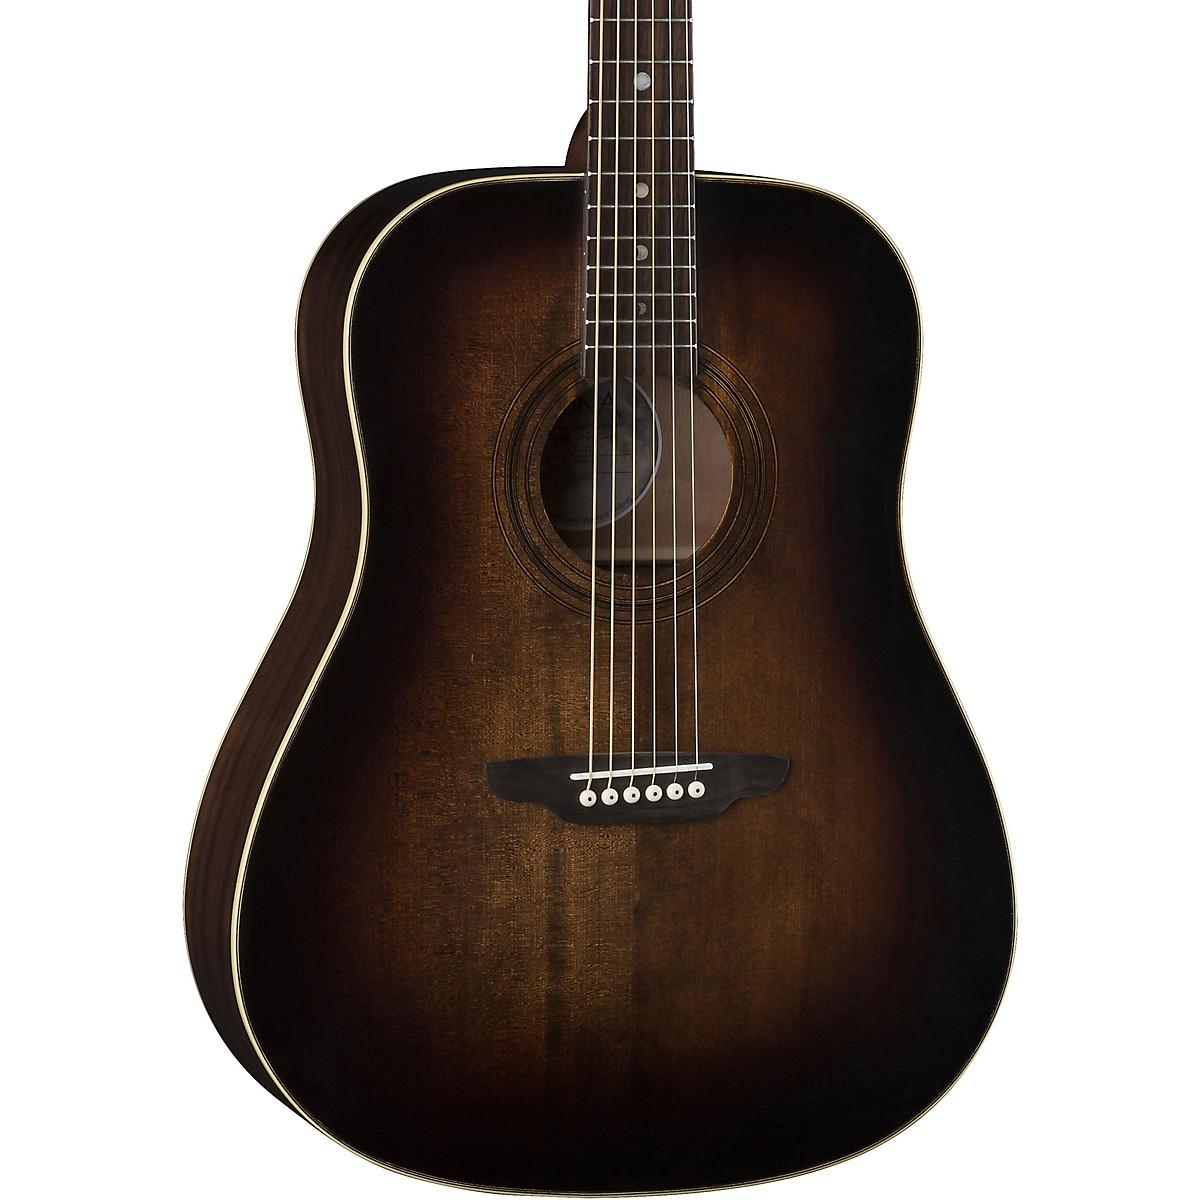 Luna Guitars Art Vintage Dread Solid Top Distressed Acoustic Guitar